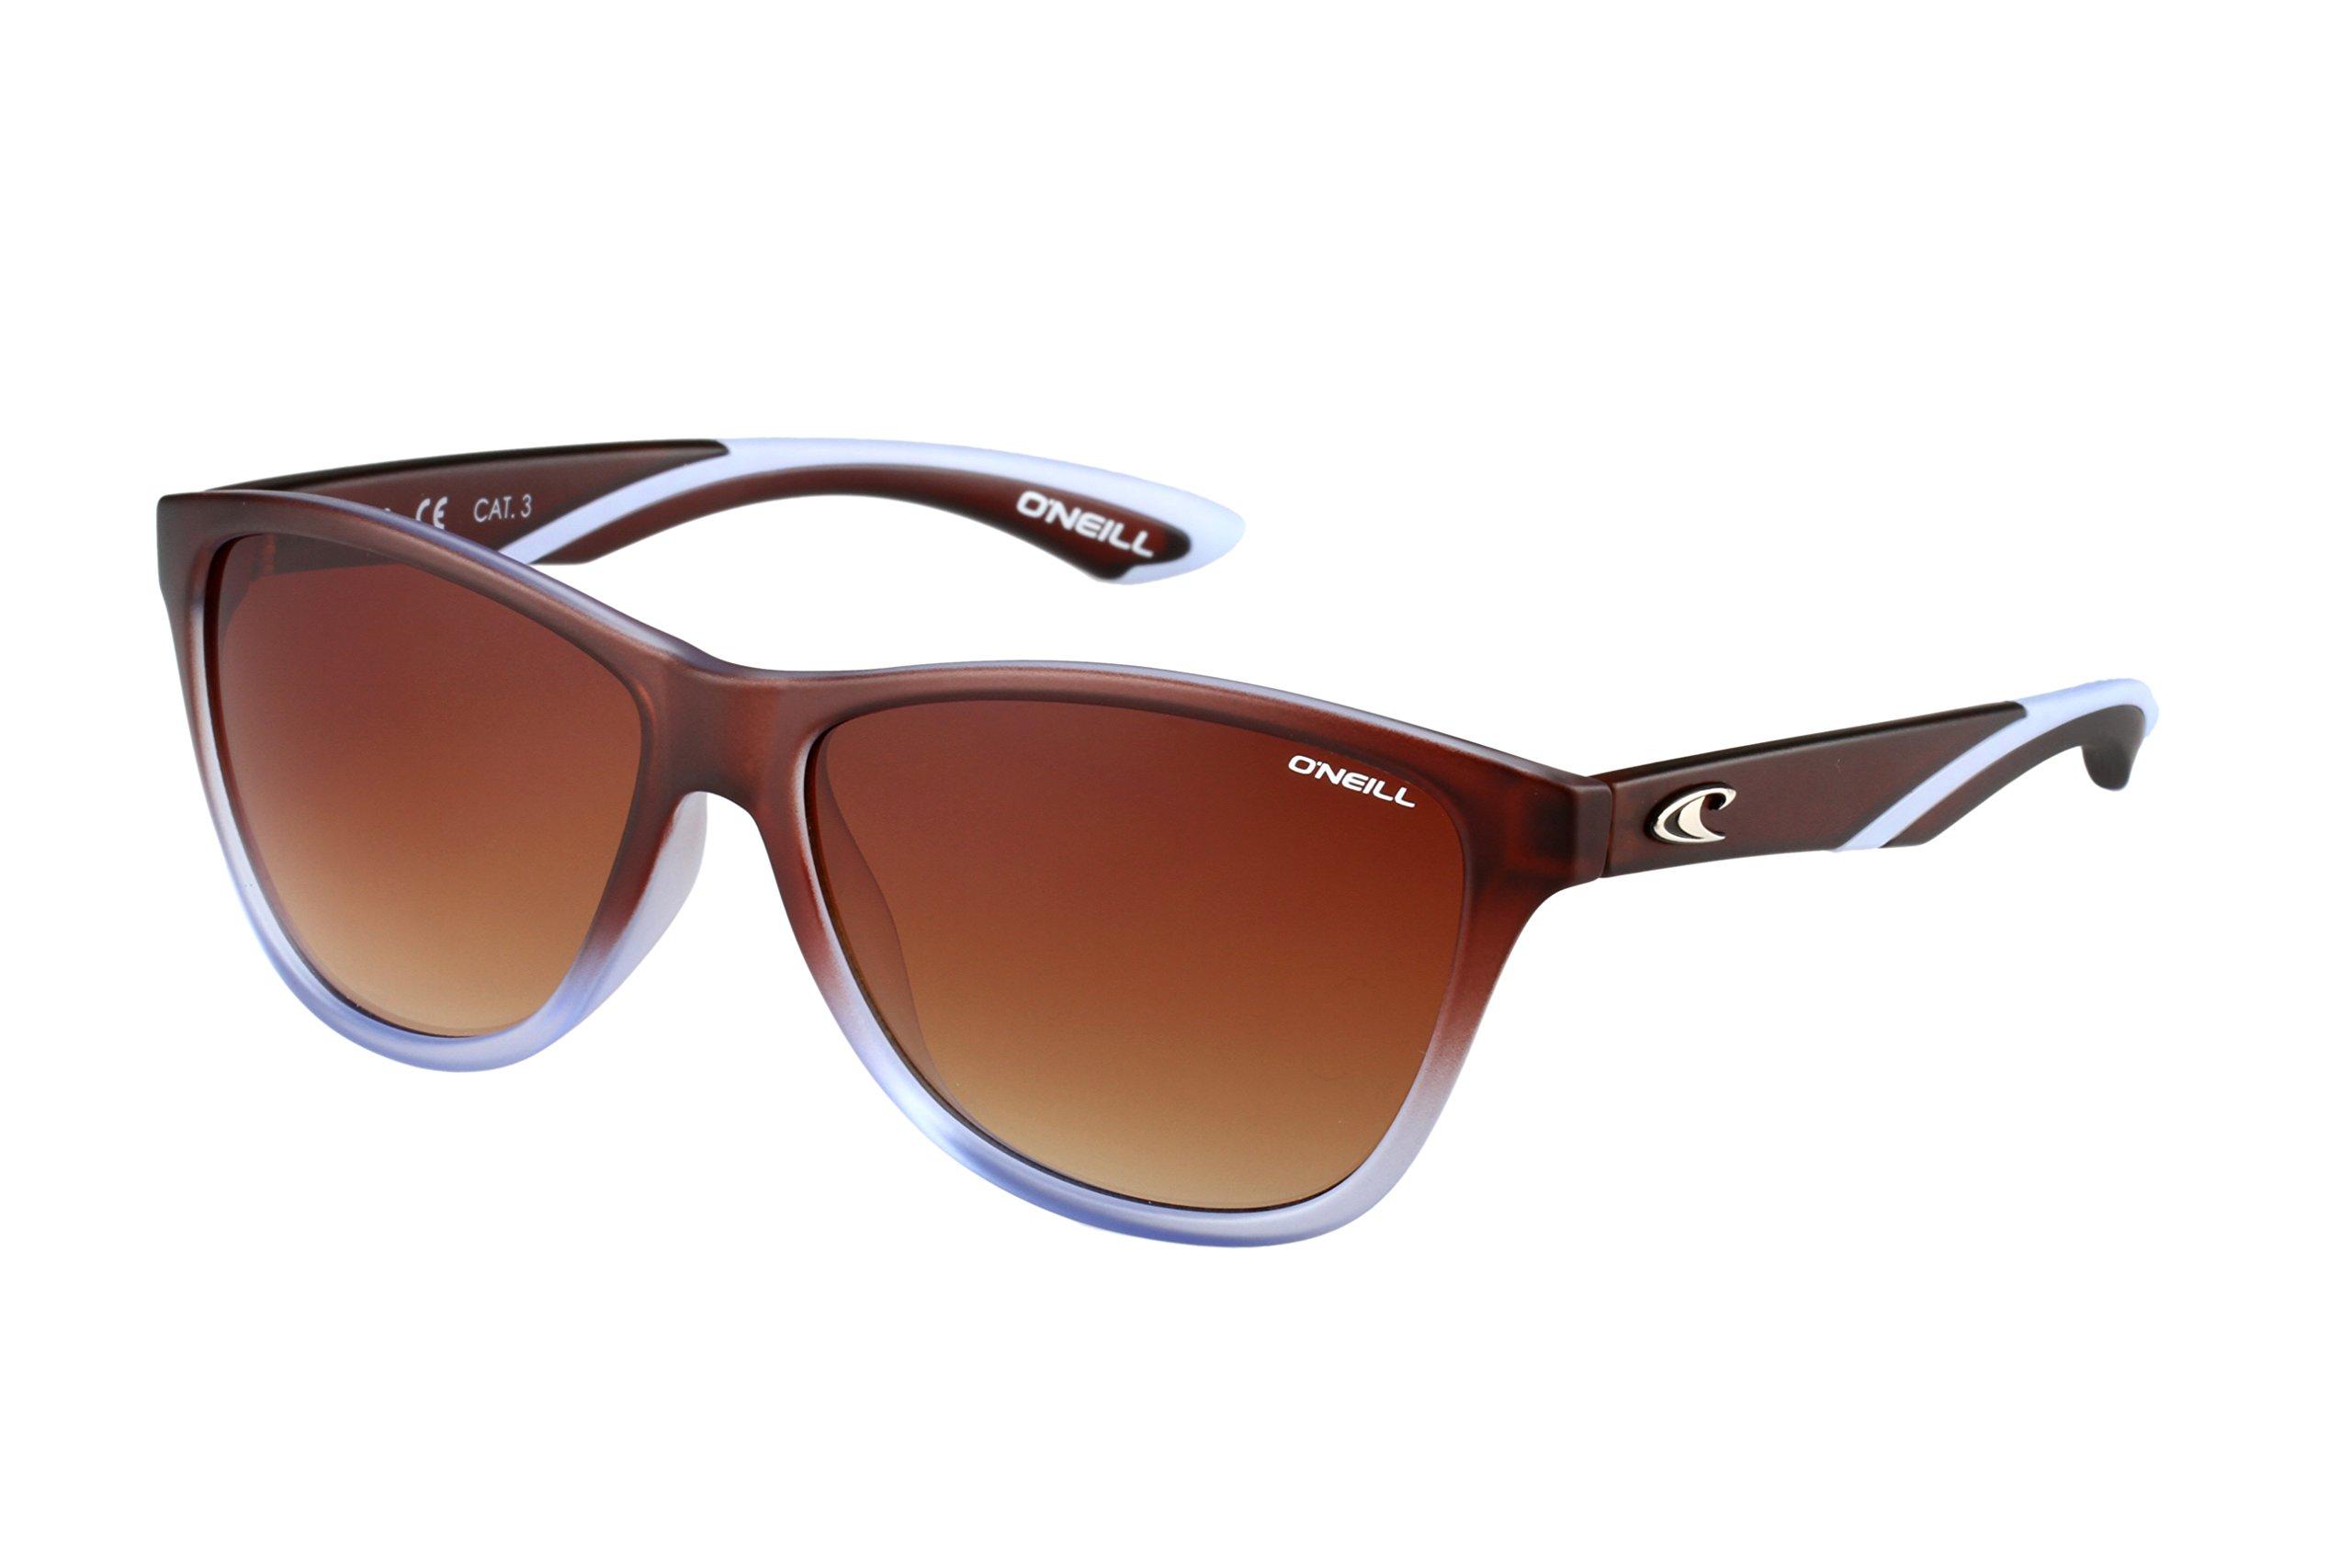 O'Neill VENUS Womens Sunglasses (Matte Brown/Blue Fade - Brown Gradient)